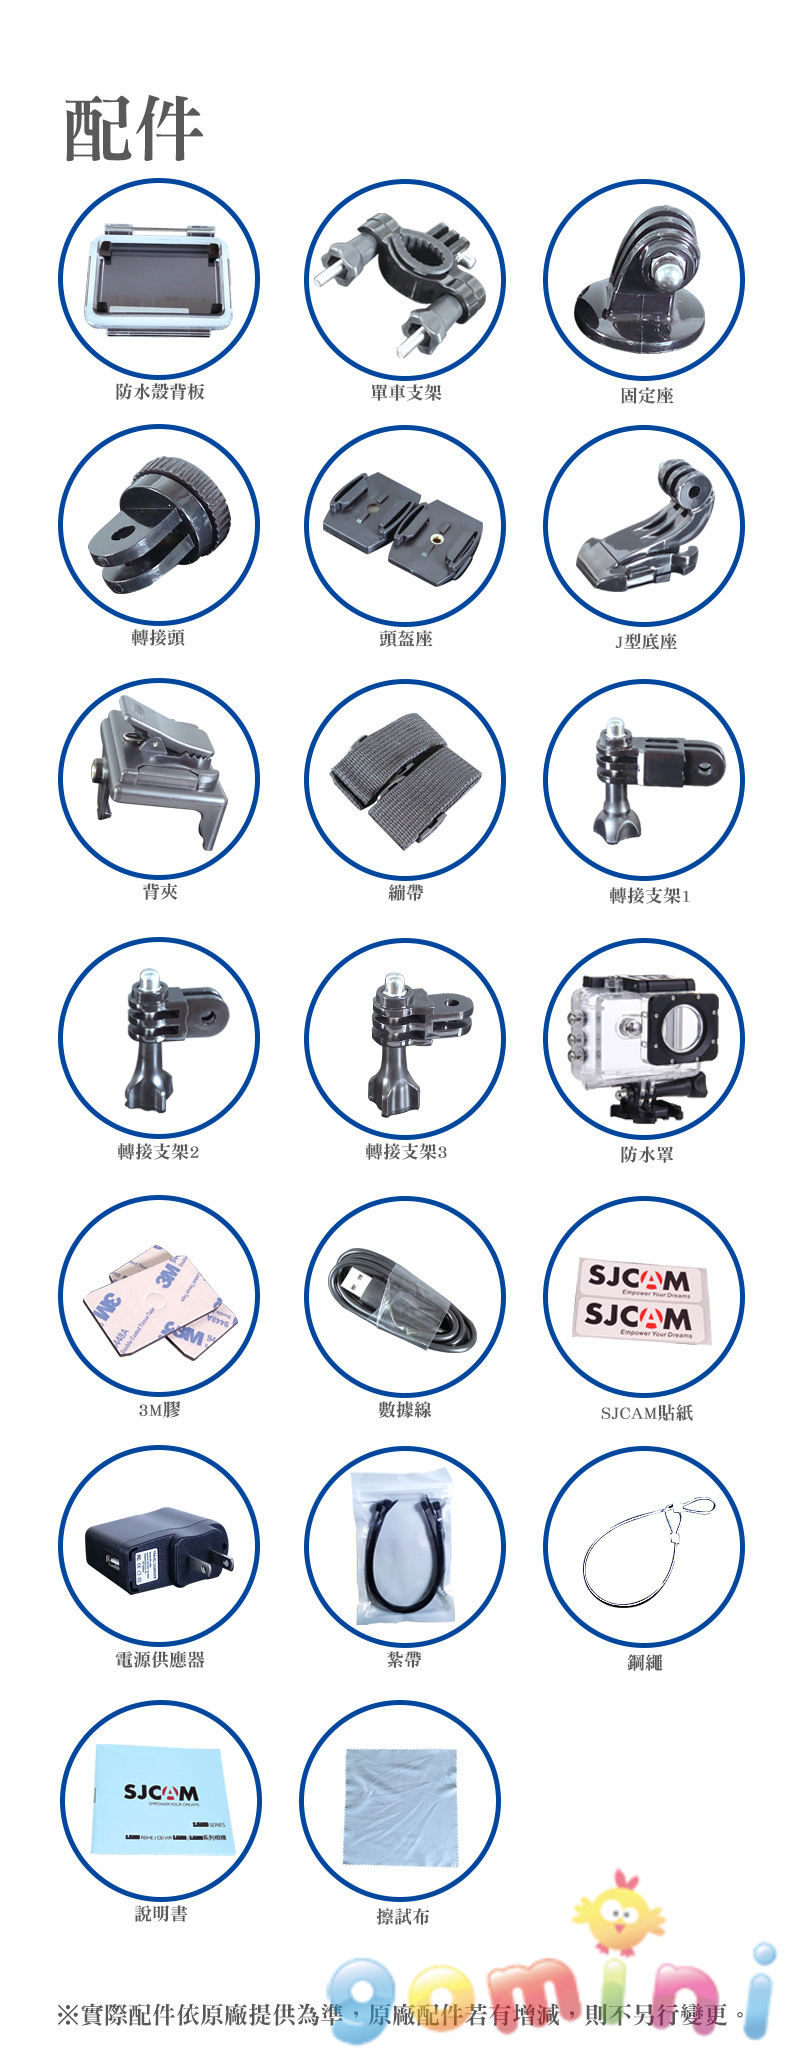 SJ4000 WIFI 配件商品圖.jpg